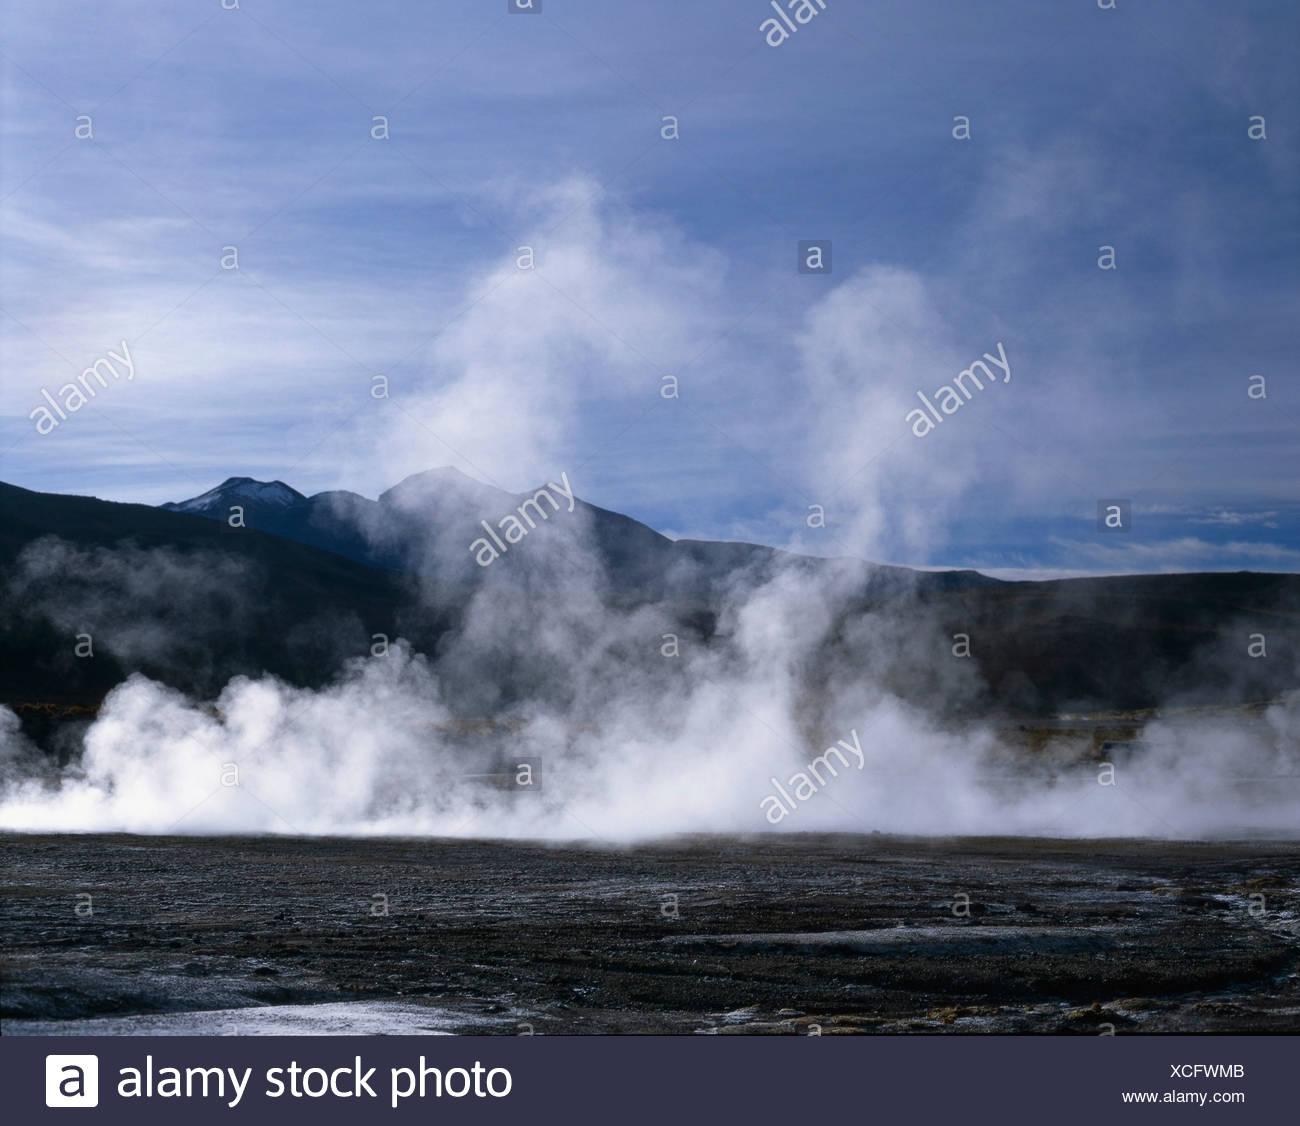 Steam At El Tatio Geysers - Stock Image